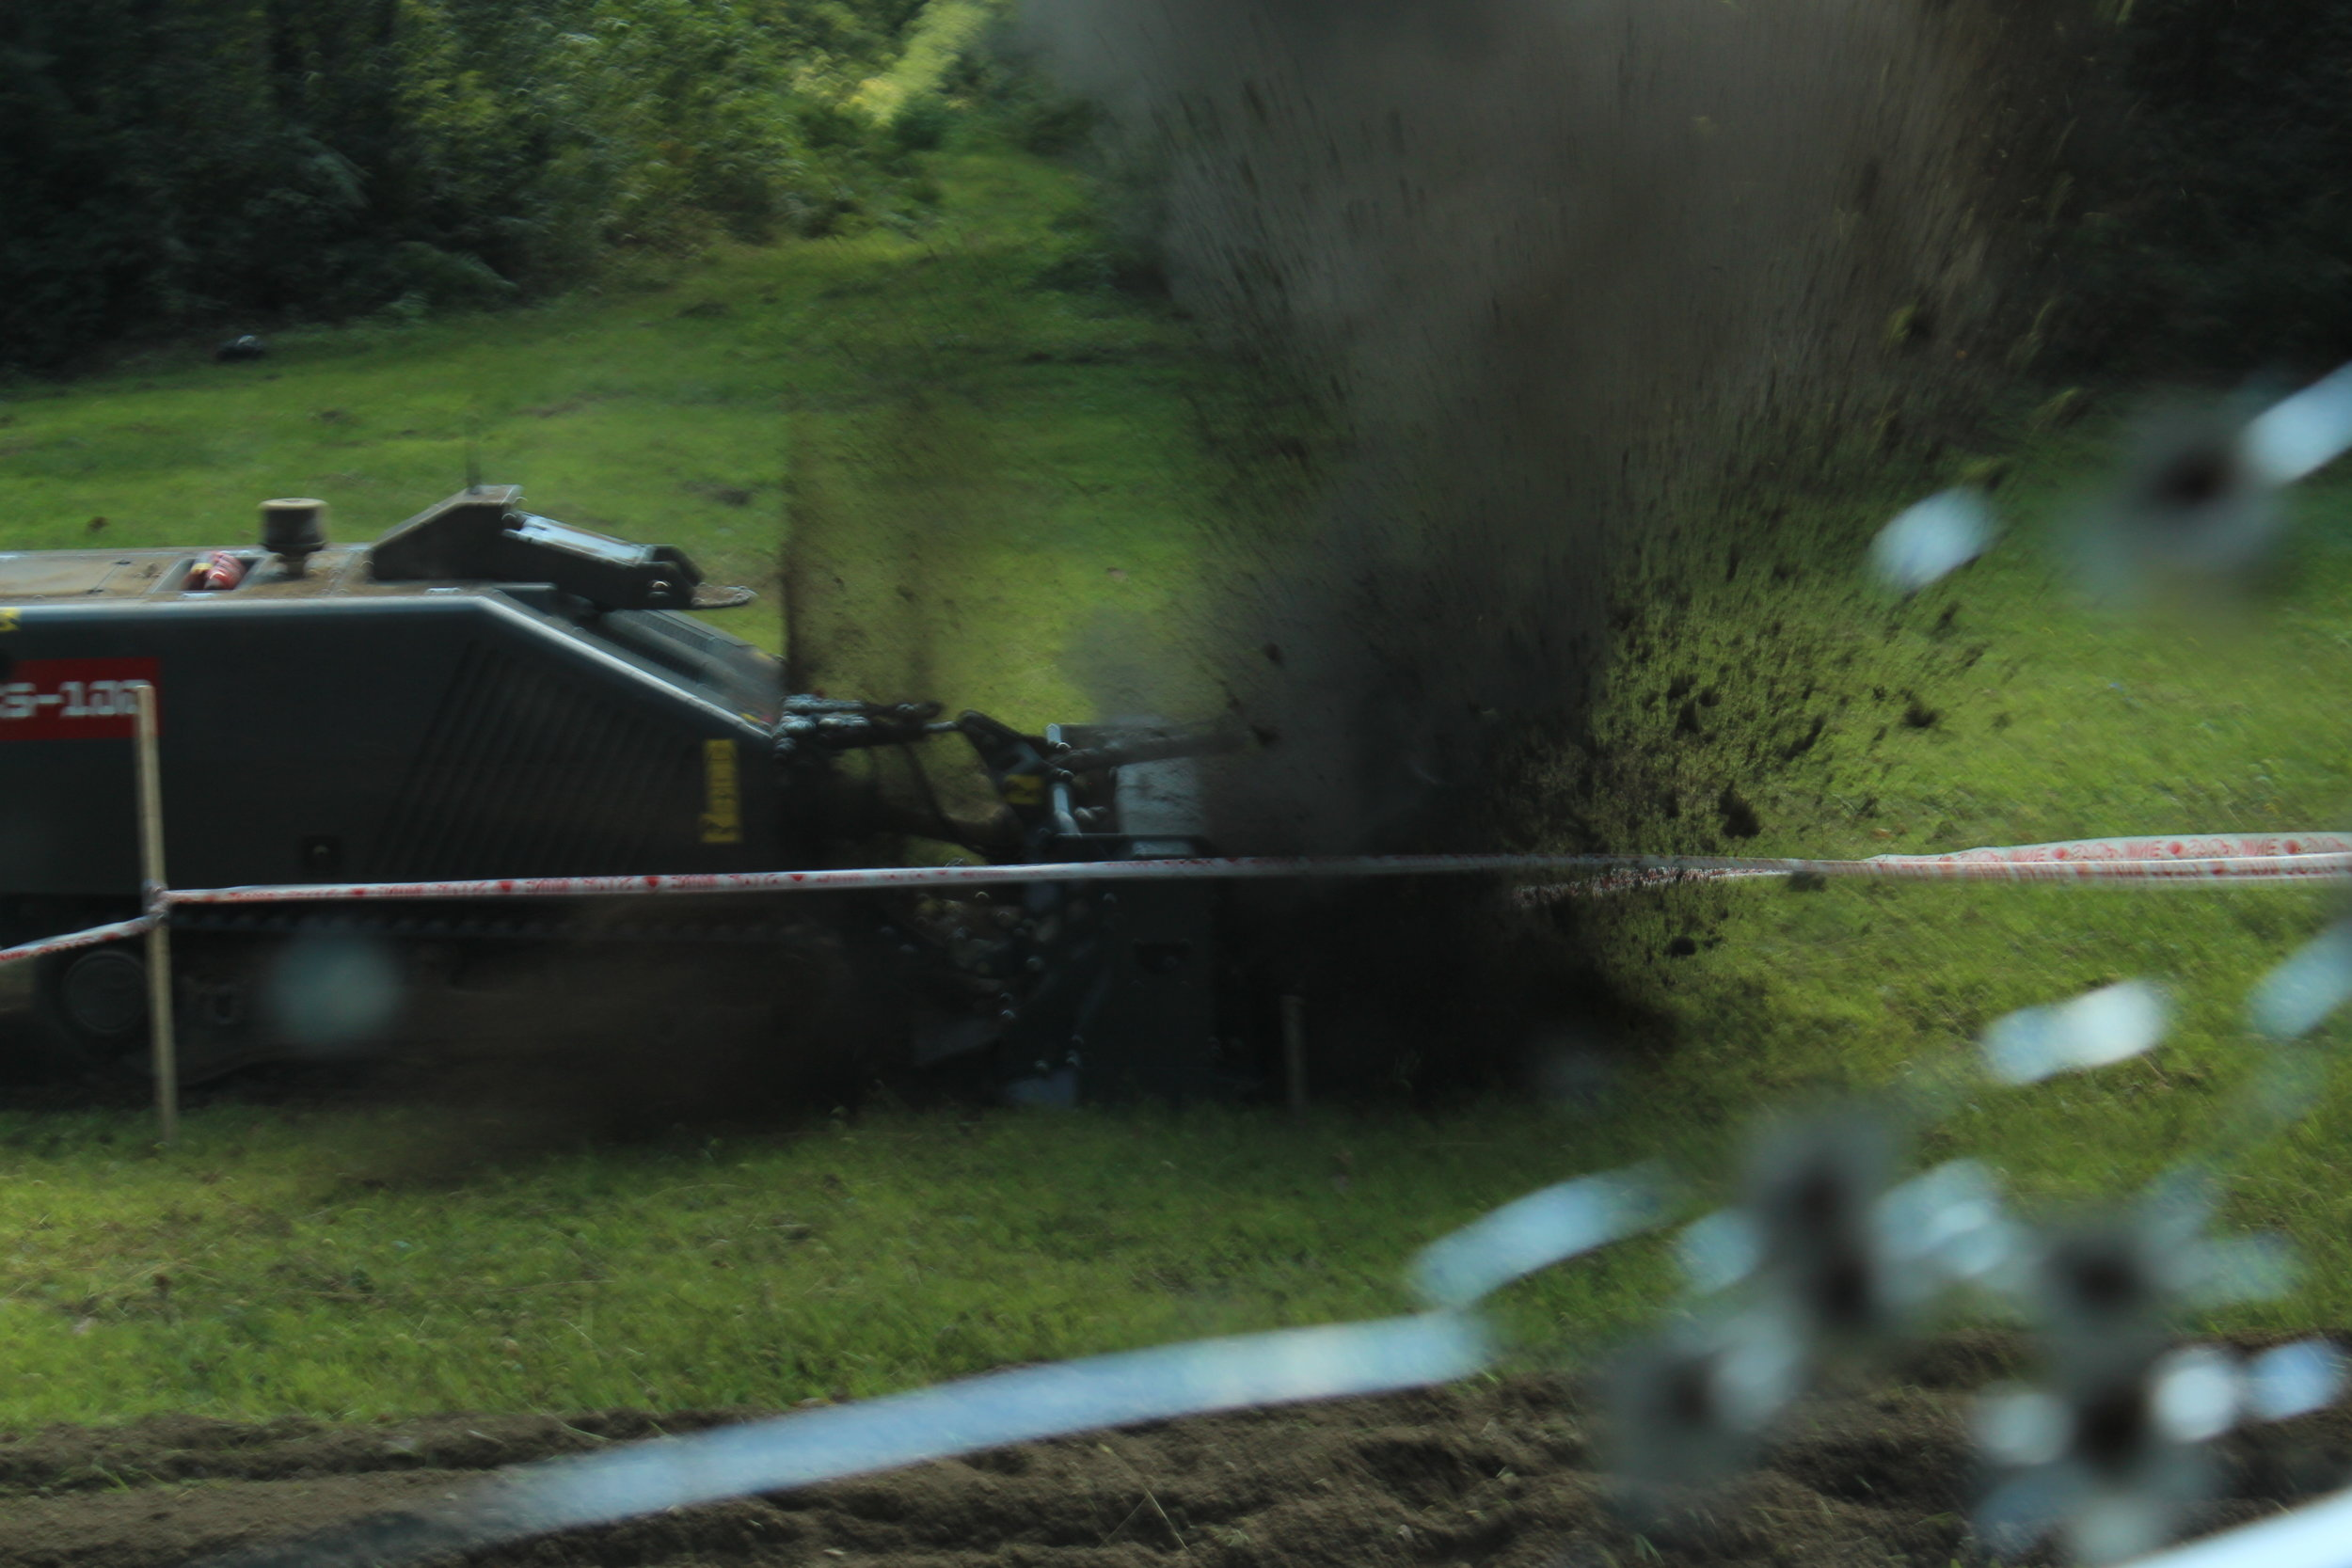 GCS-100 detonation of PMA2 mine